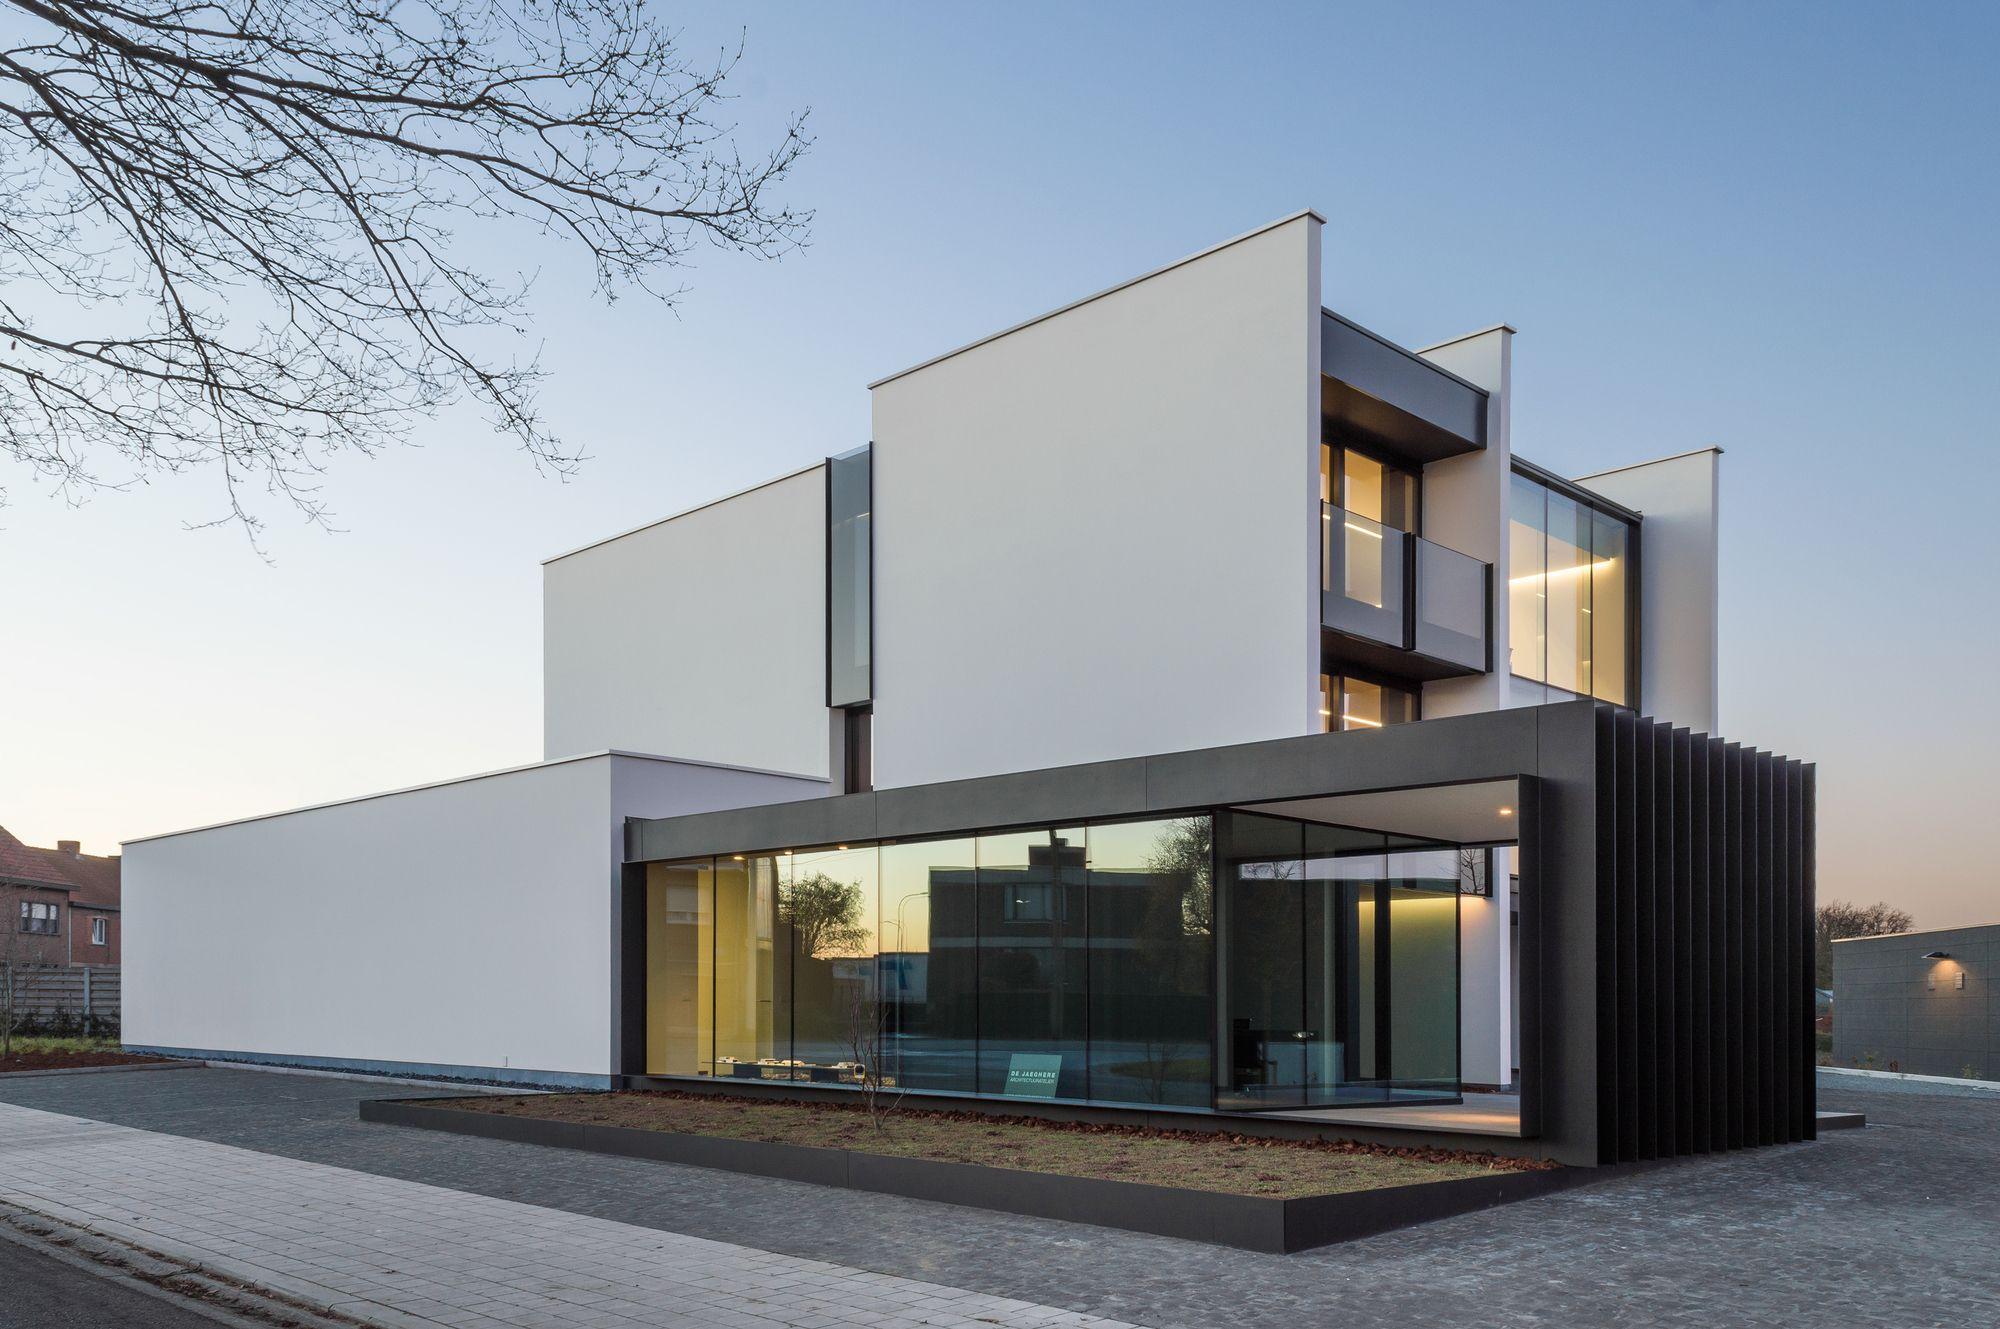 House Galera de DELTA Tielt